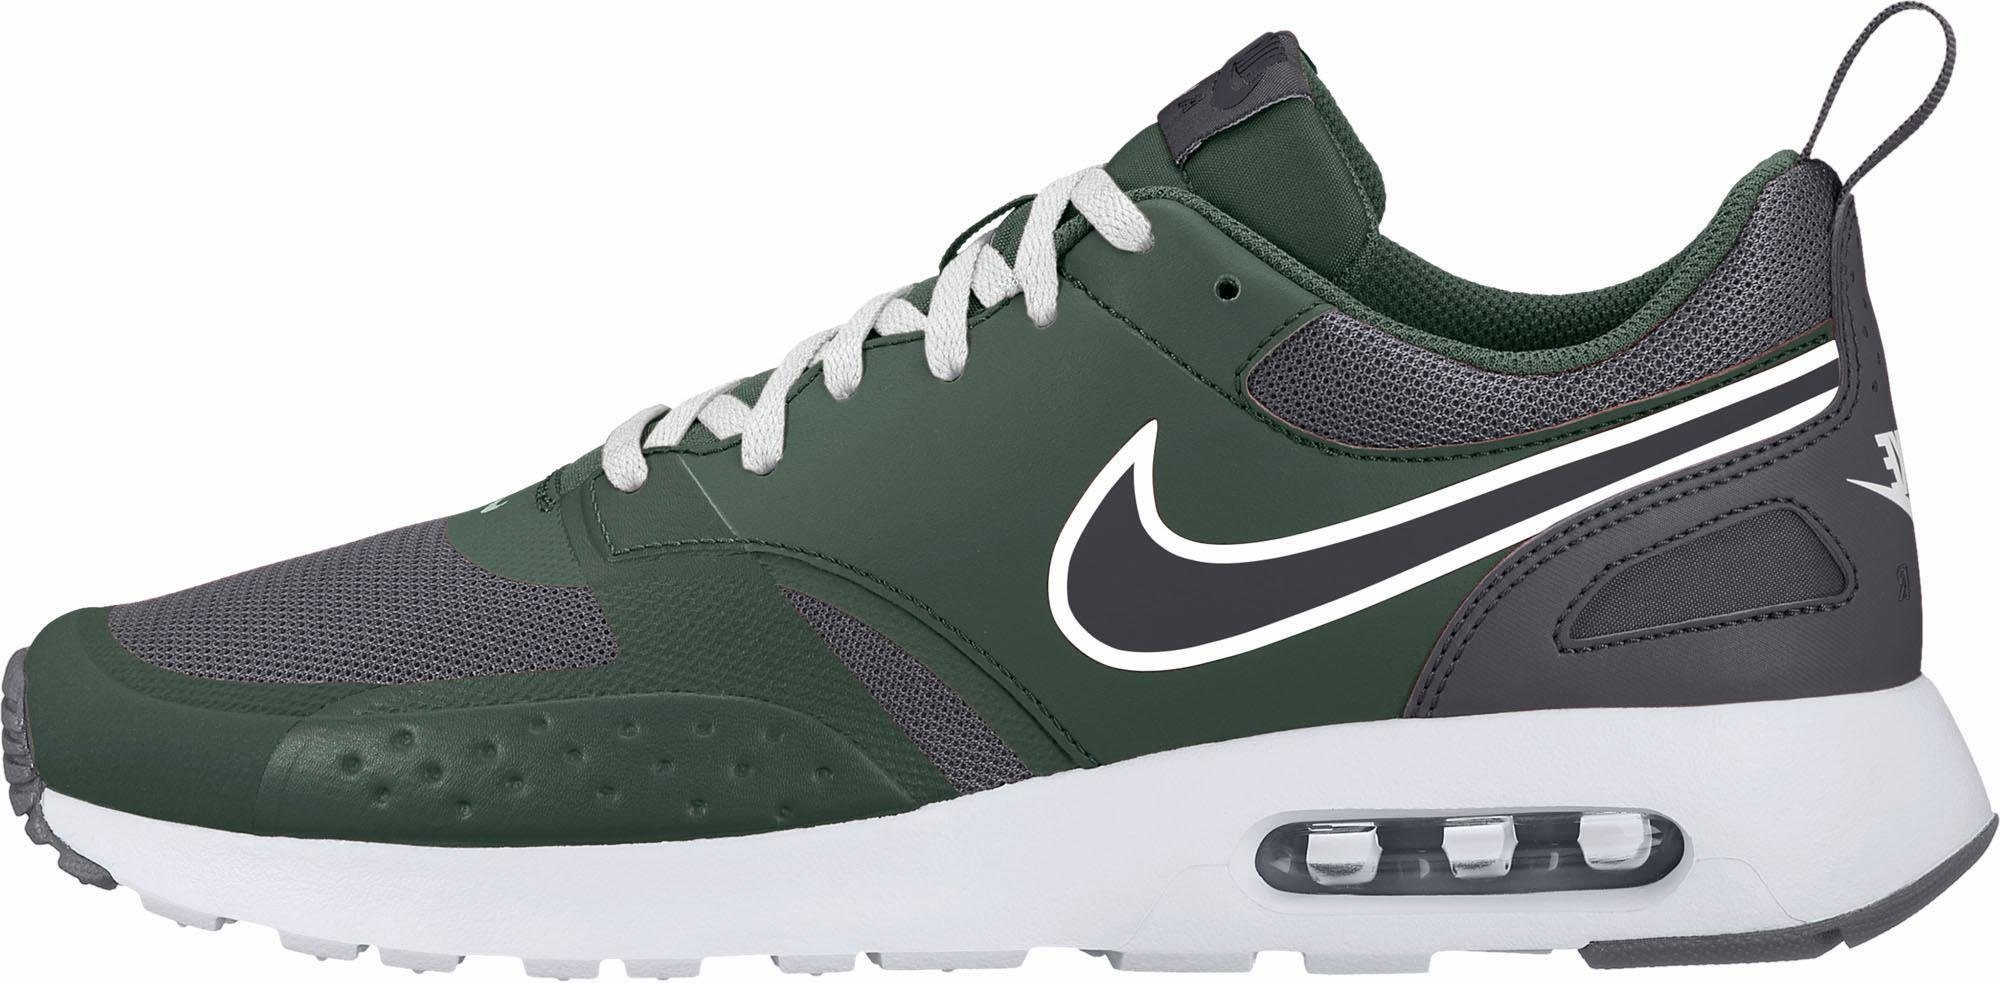 Nike Sportswear AIR MAX VISION Sneaker kaufen  olivgrün-grau